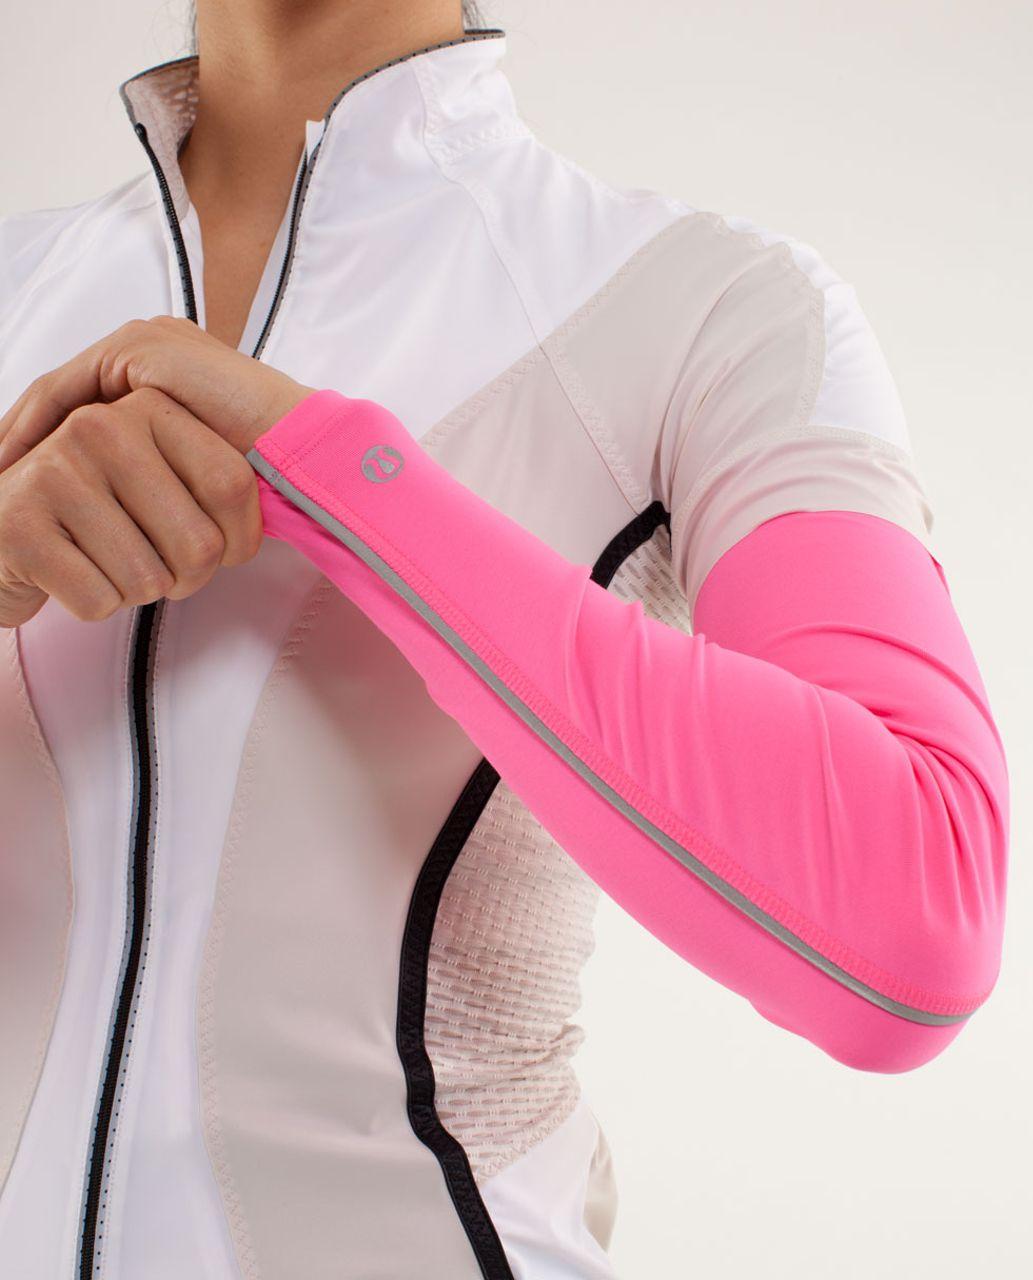 Lululemon Women's Cycling Armwarmers - Pinkelicious